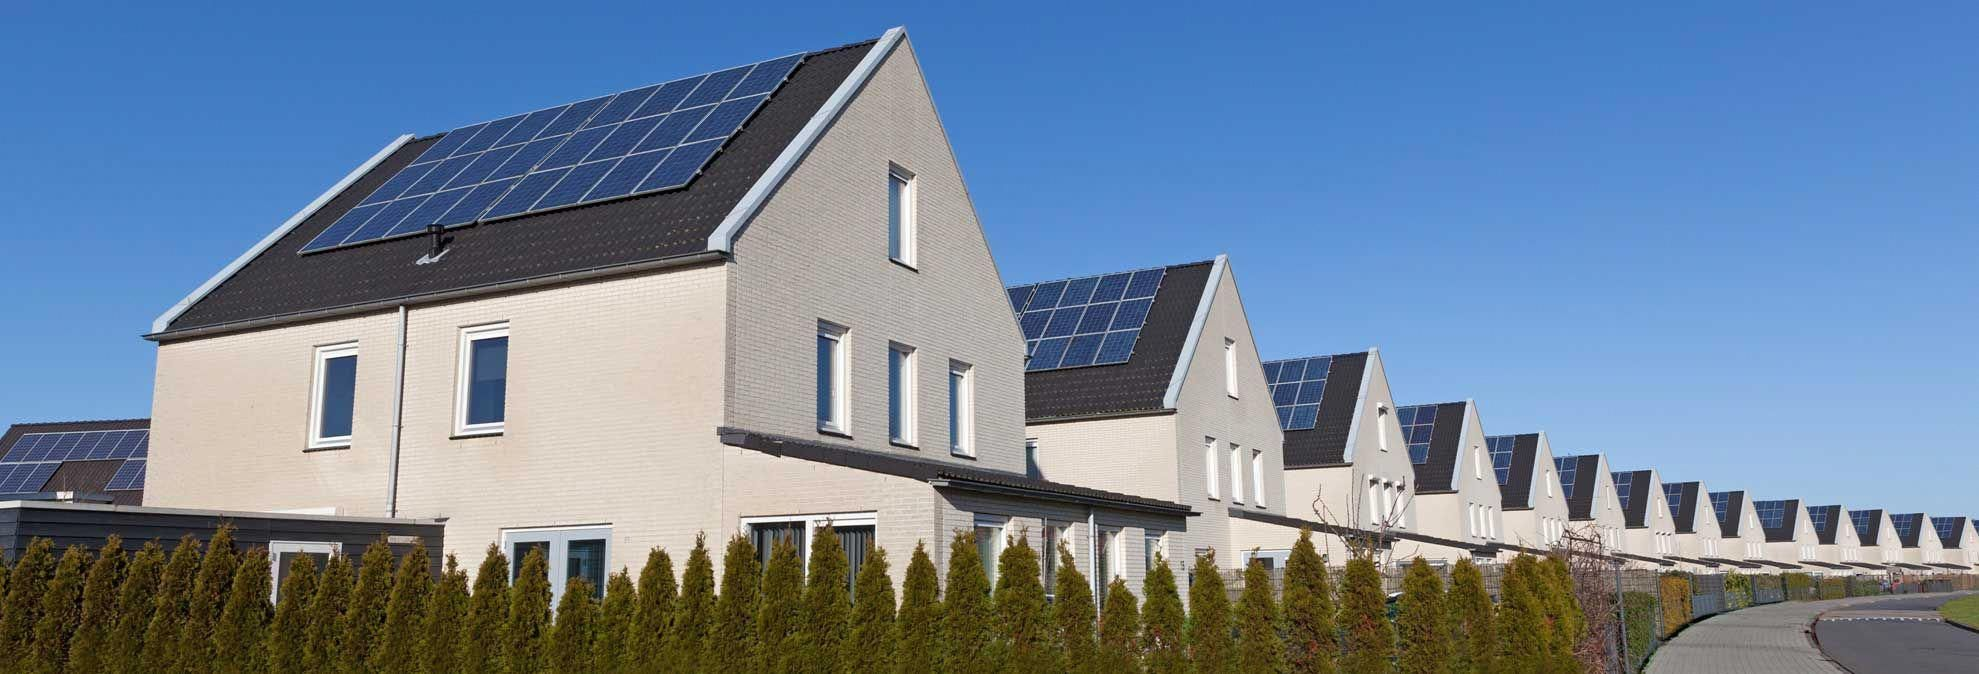 Shedding Light On Solar Power Consumer Reports Solar Panels Uses Of Solar Energy Solar